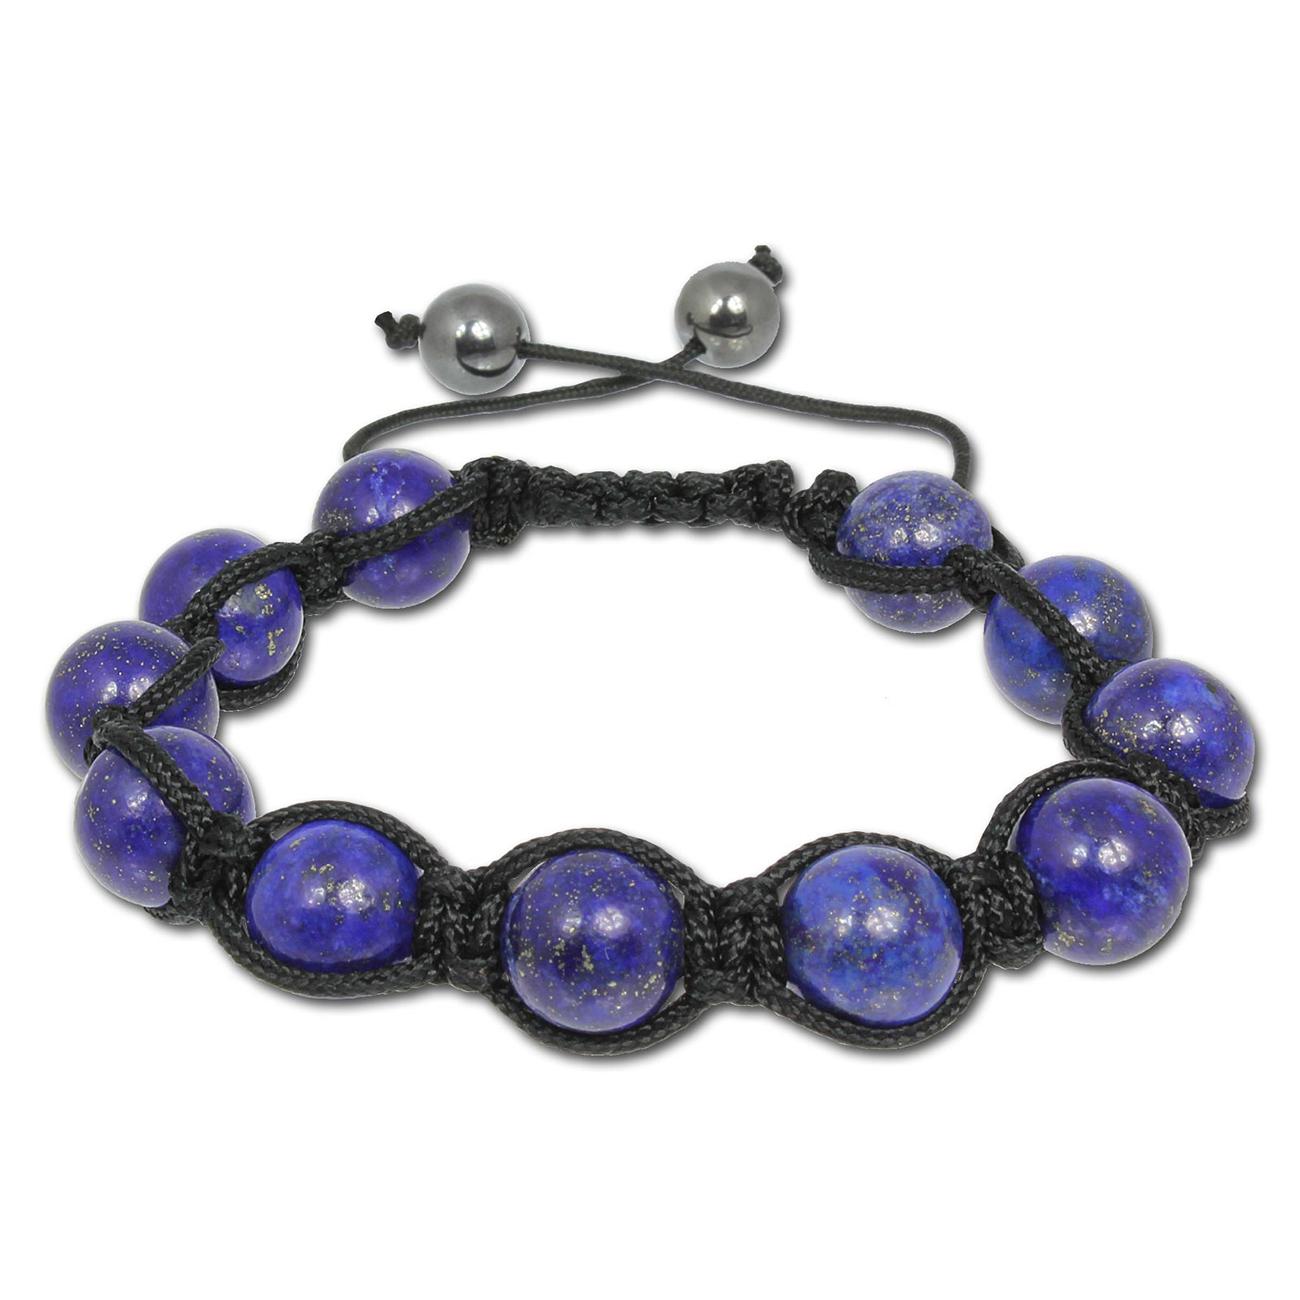 Shamballa-Armband mit blauen Aventura